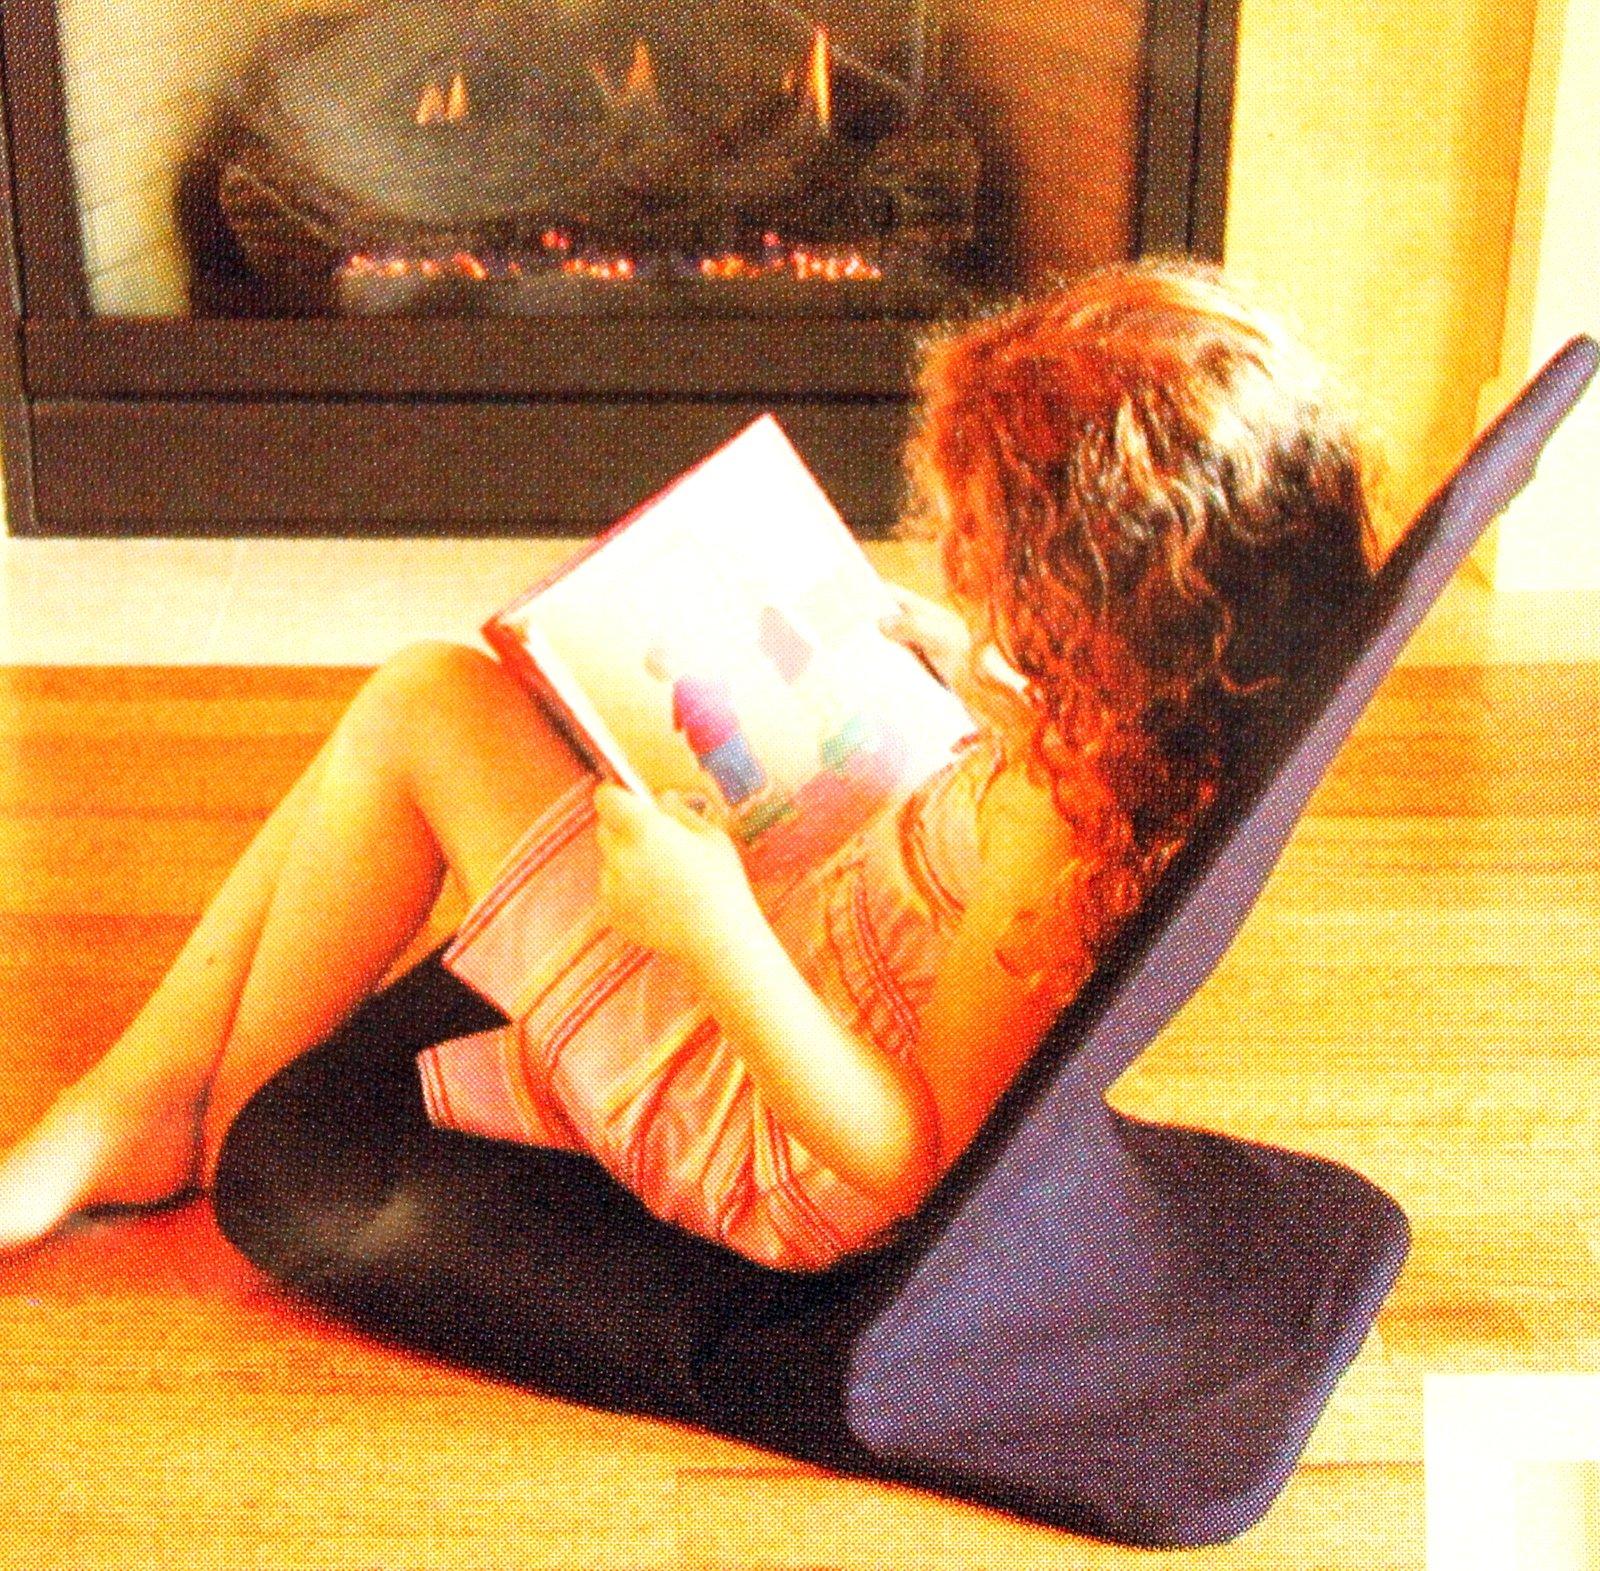 Portable Floor Chair, MEMORY FOAM Seat, Folding Chair. Angle Back-Rest. 14'' W x 22'' H x 21'' Deep (Black)